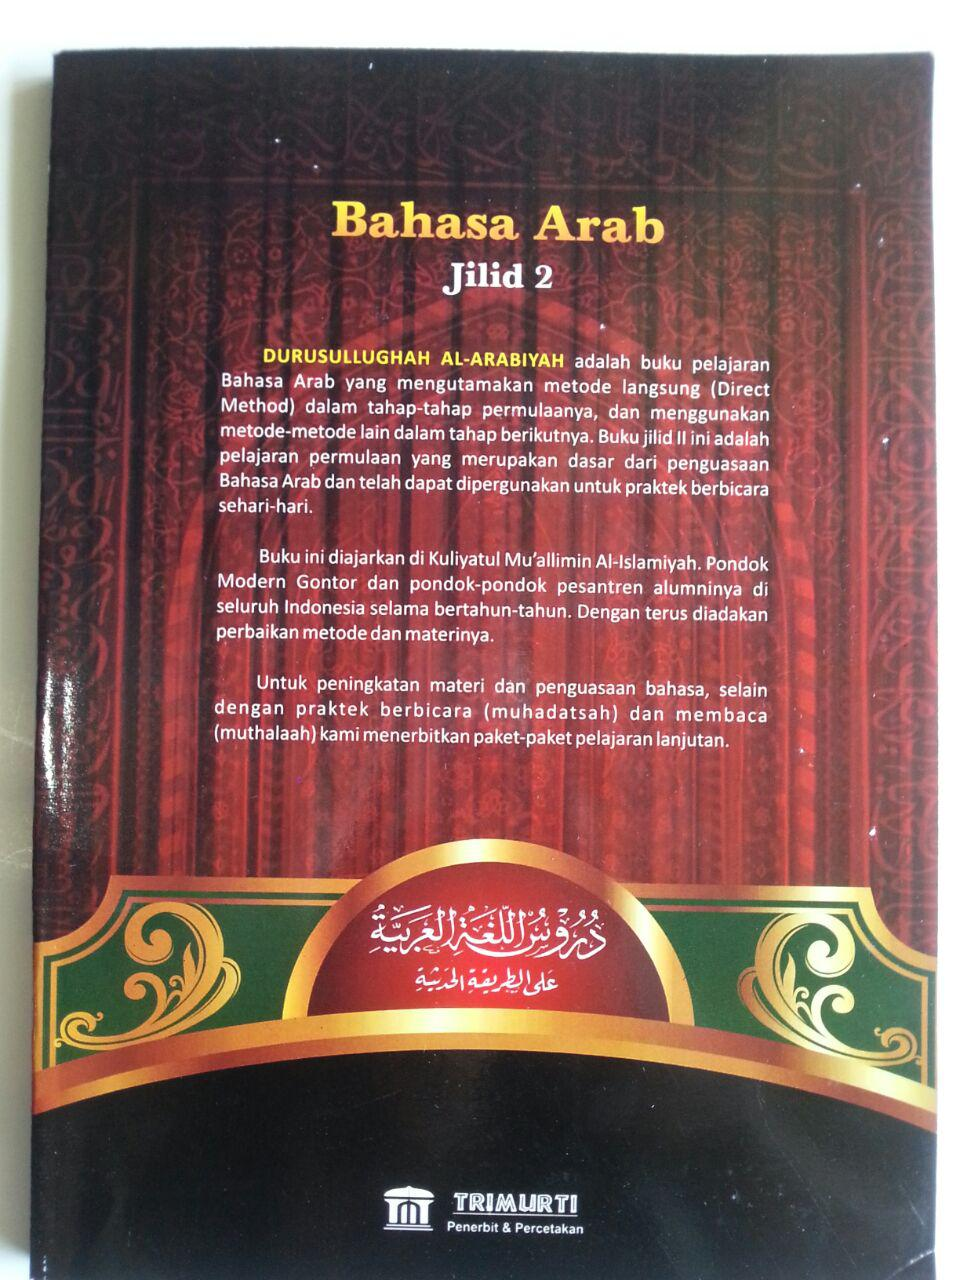 Buku Durusul Lughoh Versi Gontor (2 Jilid) cover 4